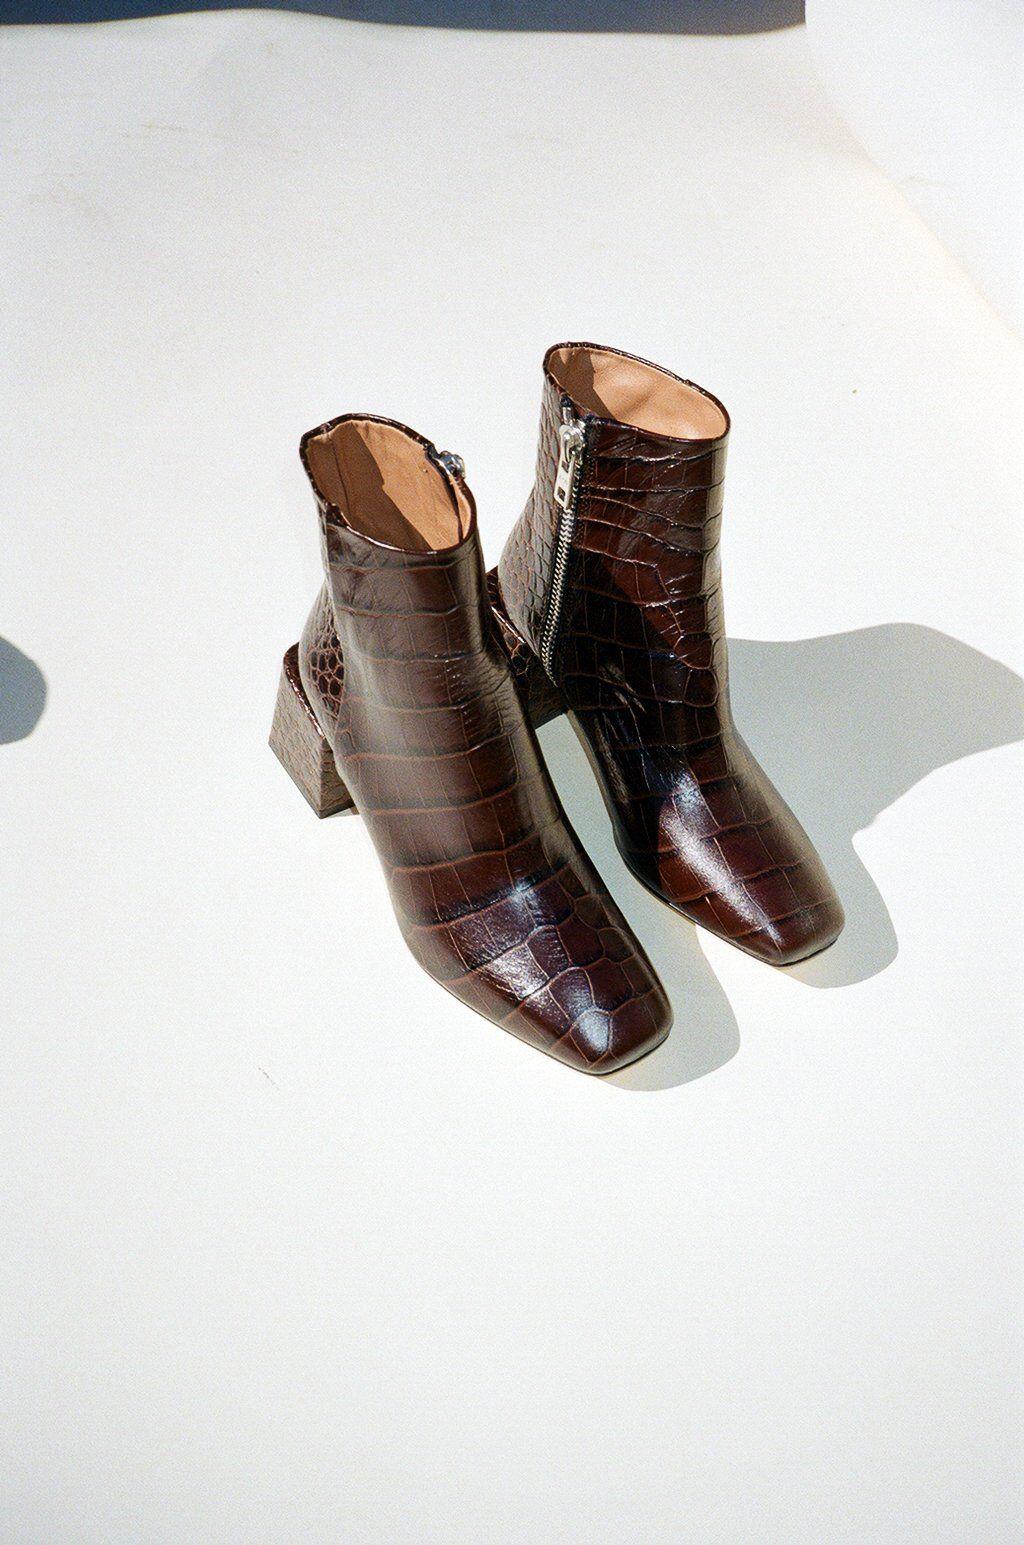 Lazaro Boot - Bombon Croc #adidasclothes